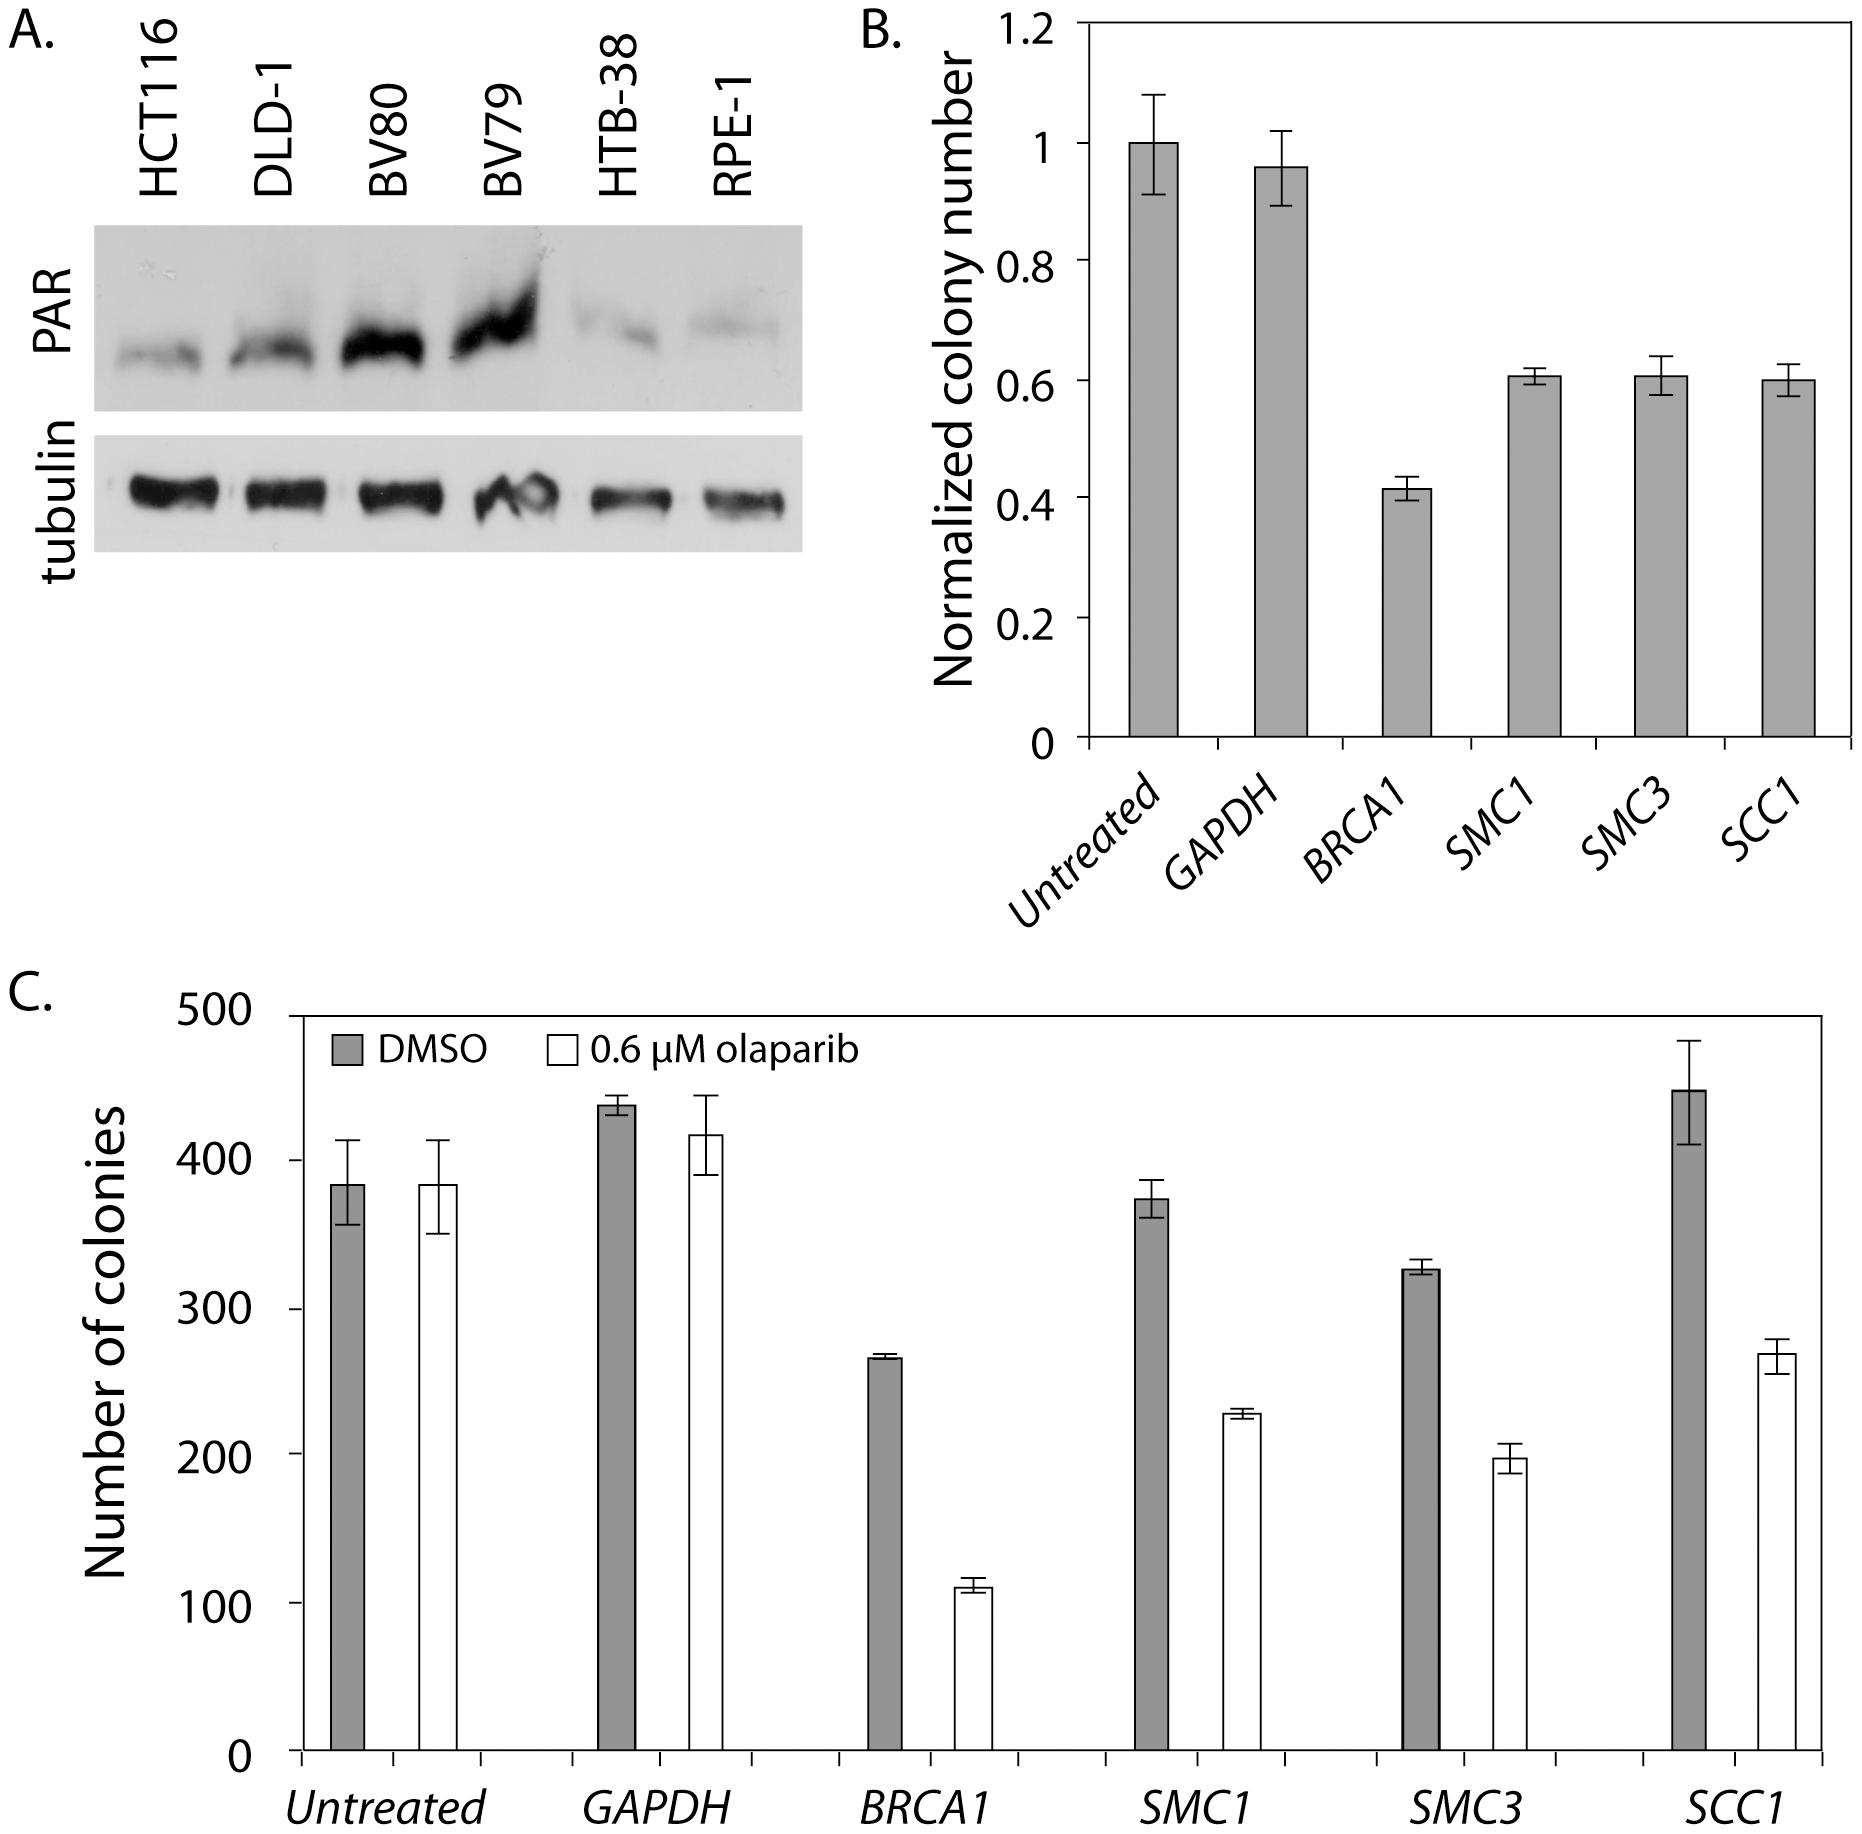 <i>SMC1</i> and <i>PARP</i> genetically interact in HTB-38 human cells.